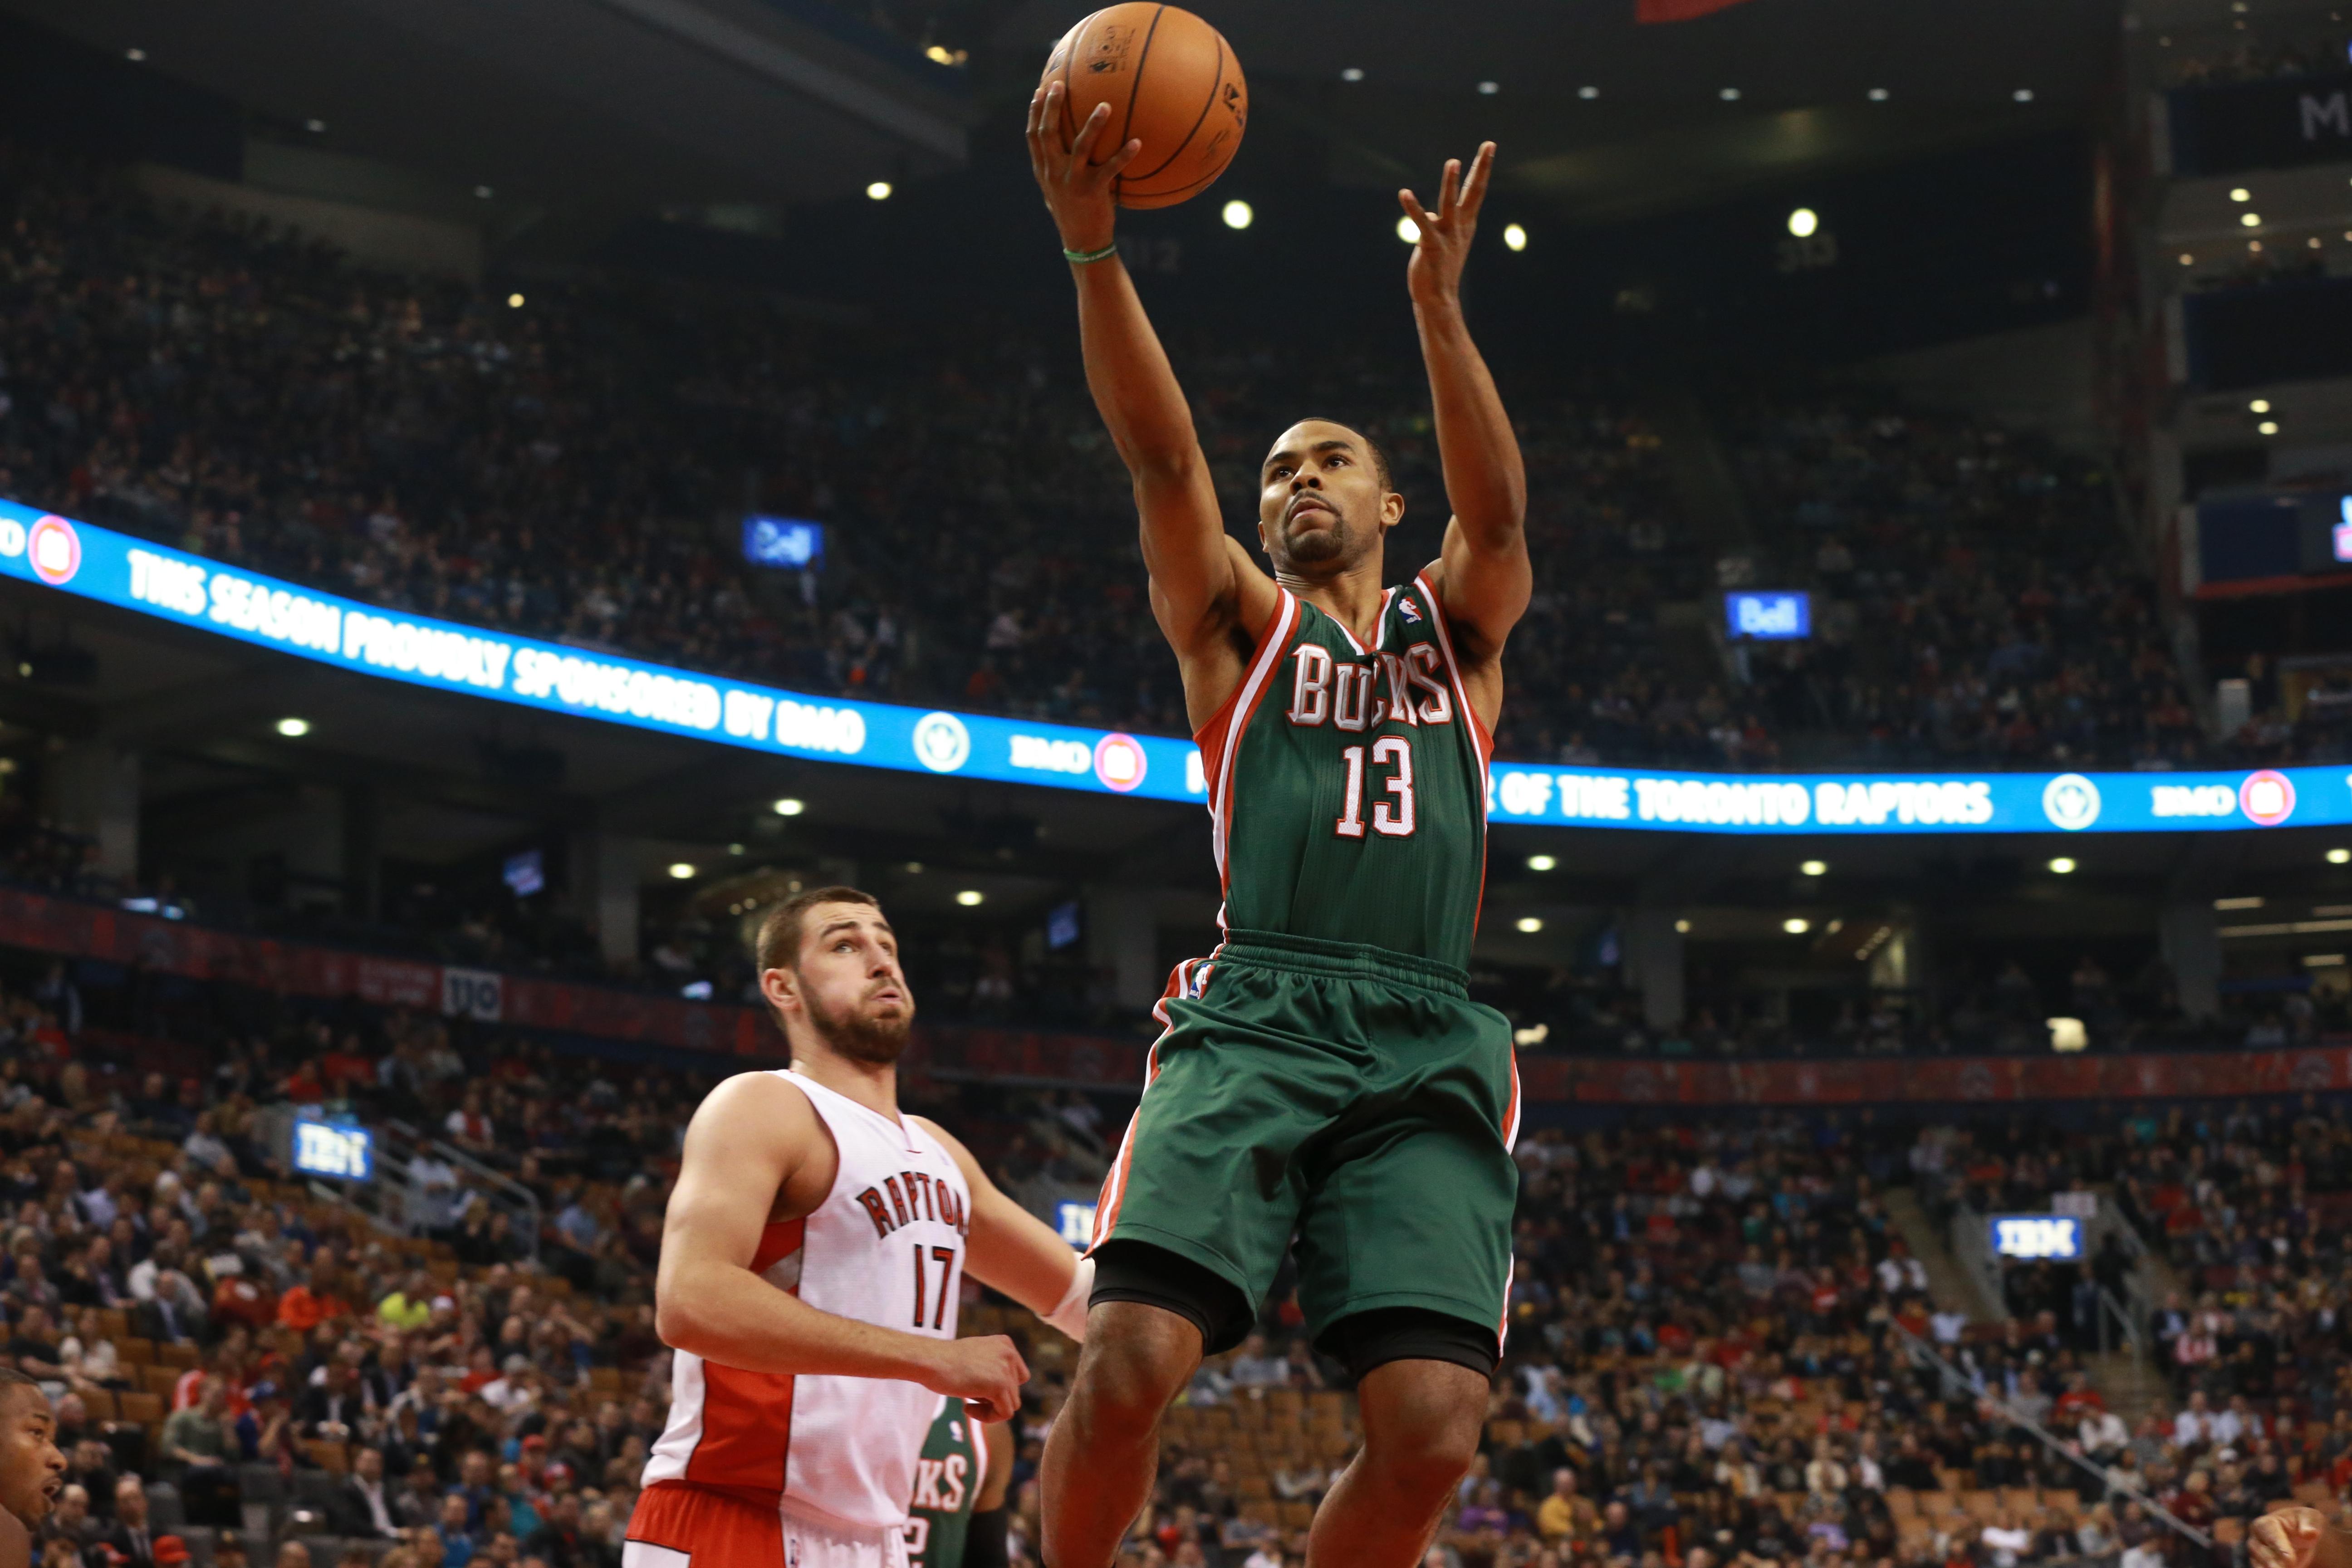 Bucks v Raptors